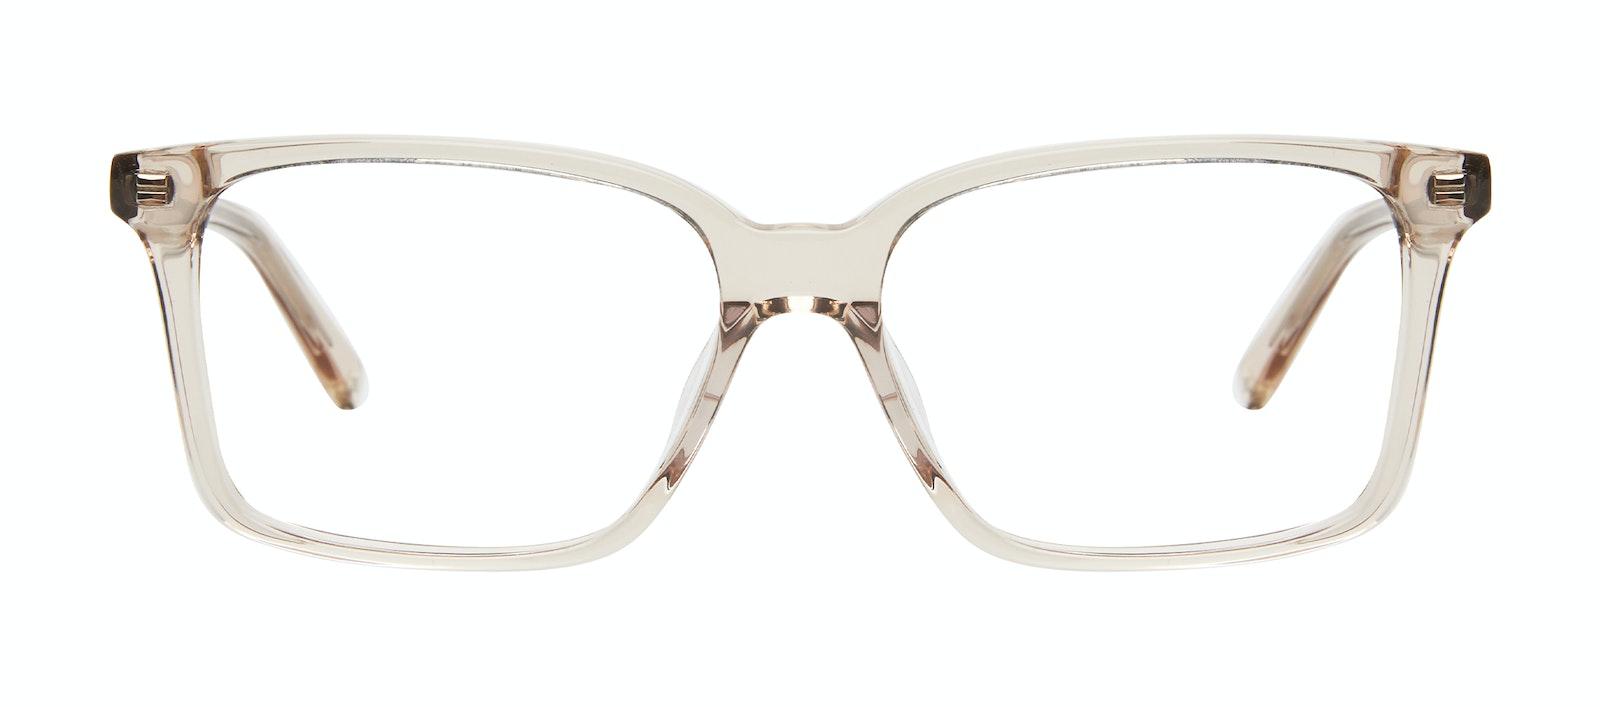 Affordable Fashion Glasses Square Eyeglasses Men Lapel Golden Front